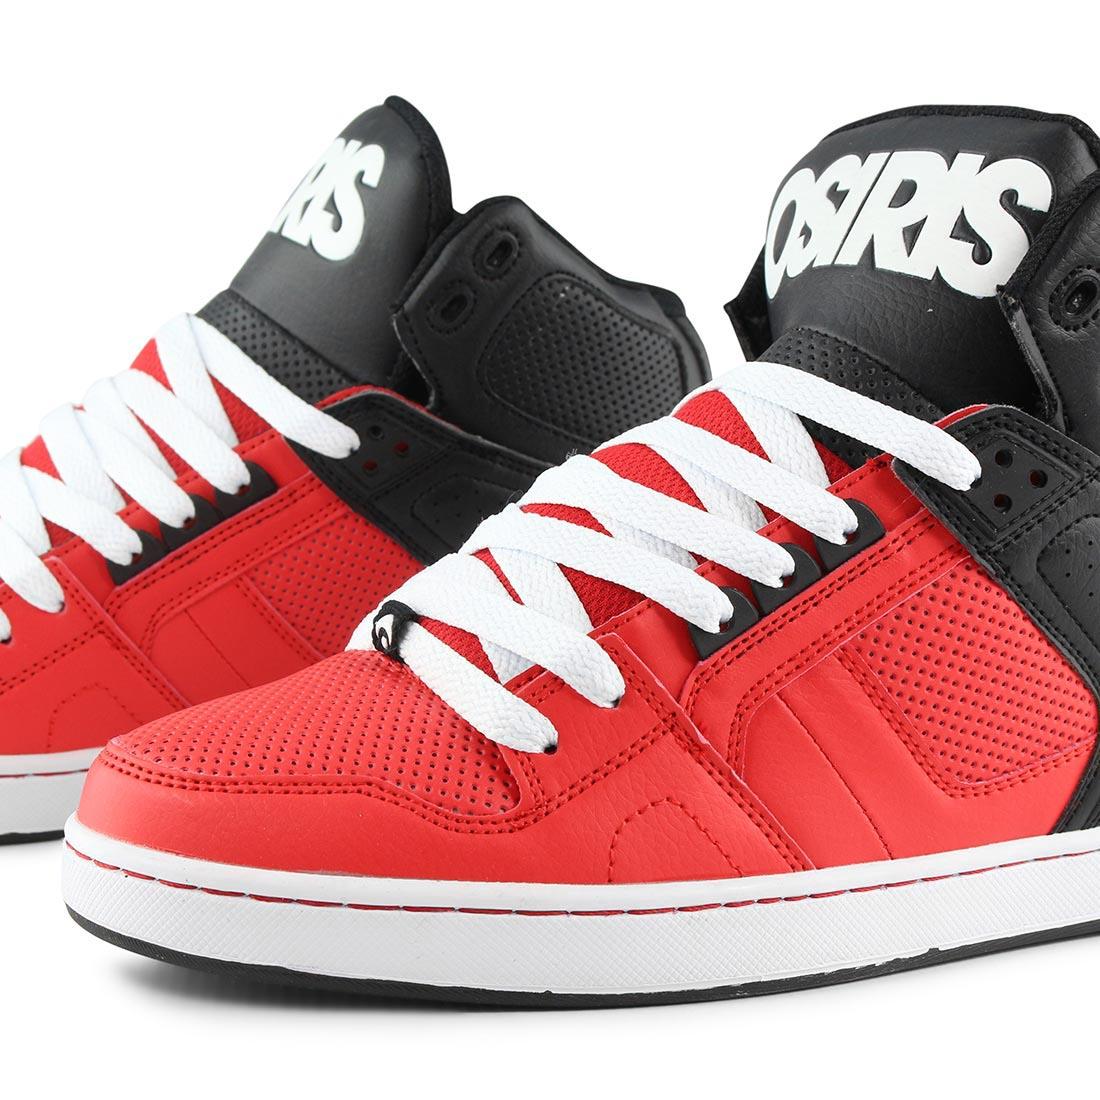 Osiris NYC 83 CLK High Top Shoes - Red